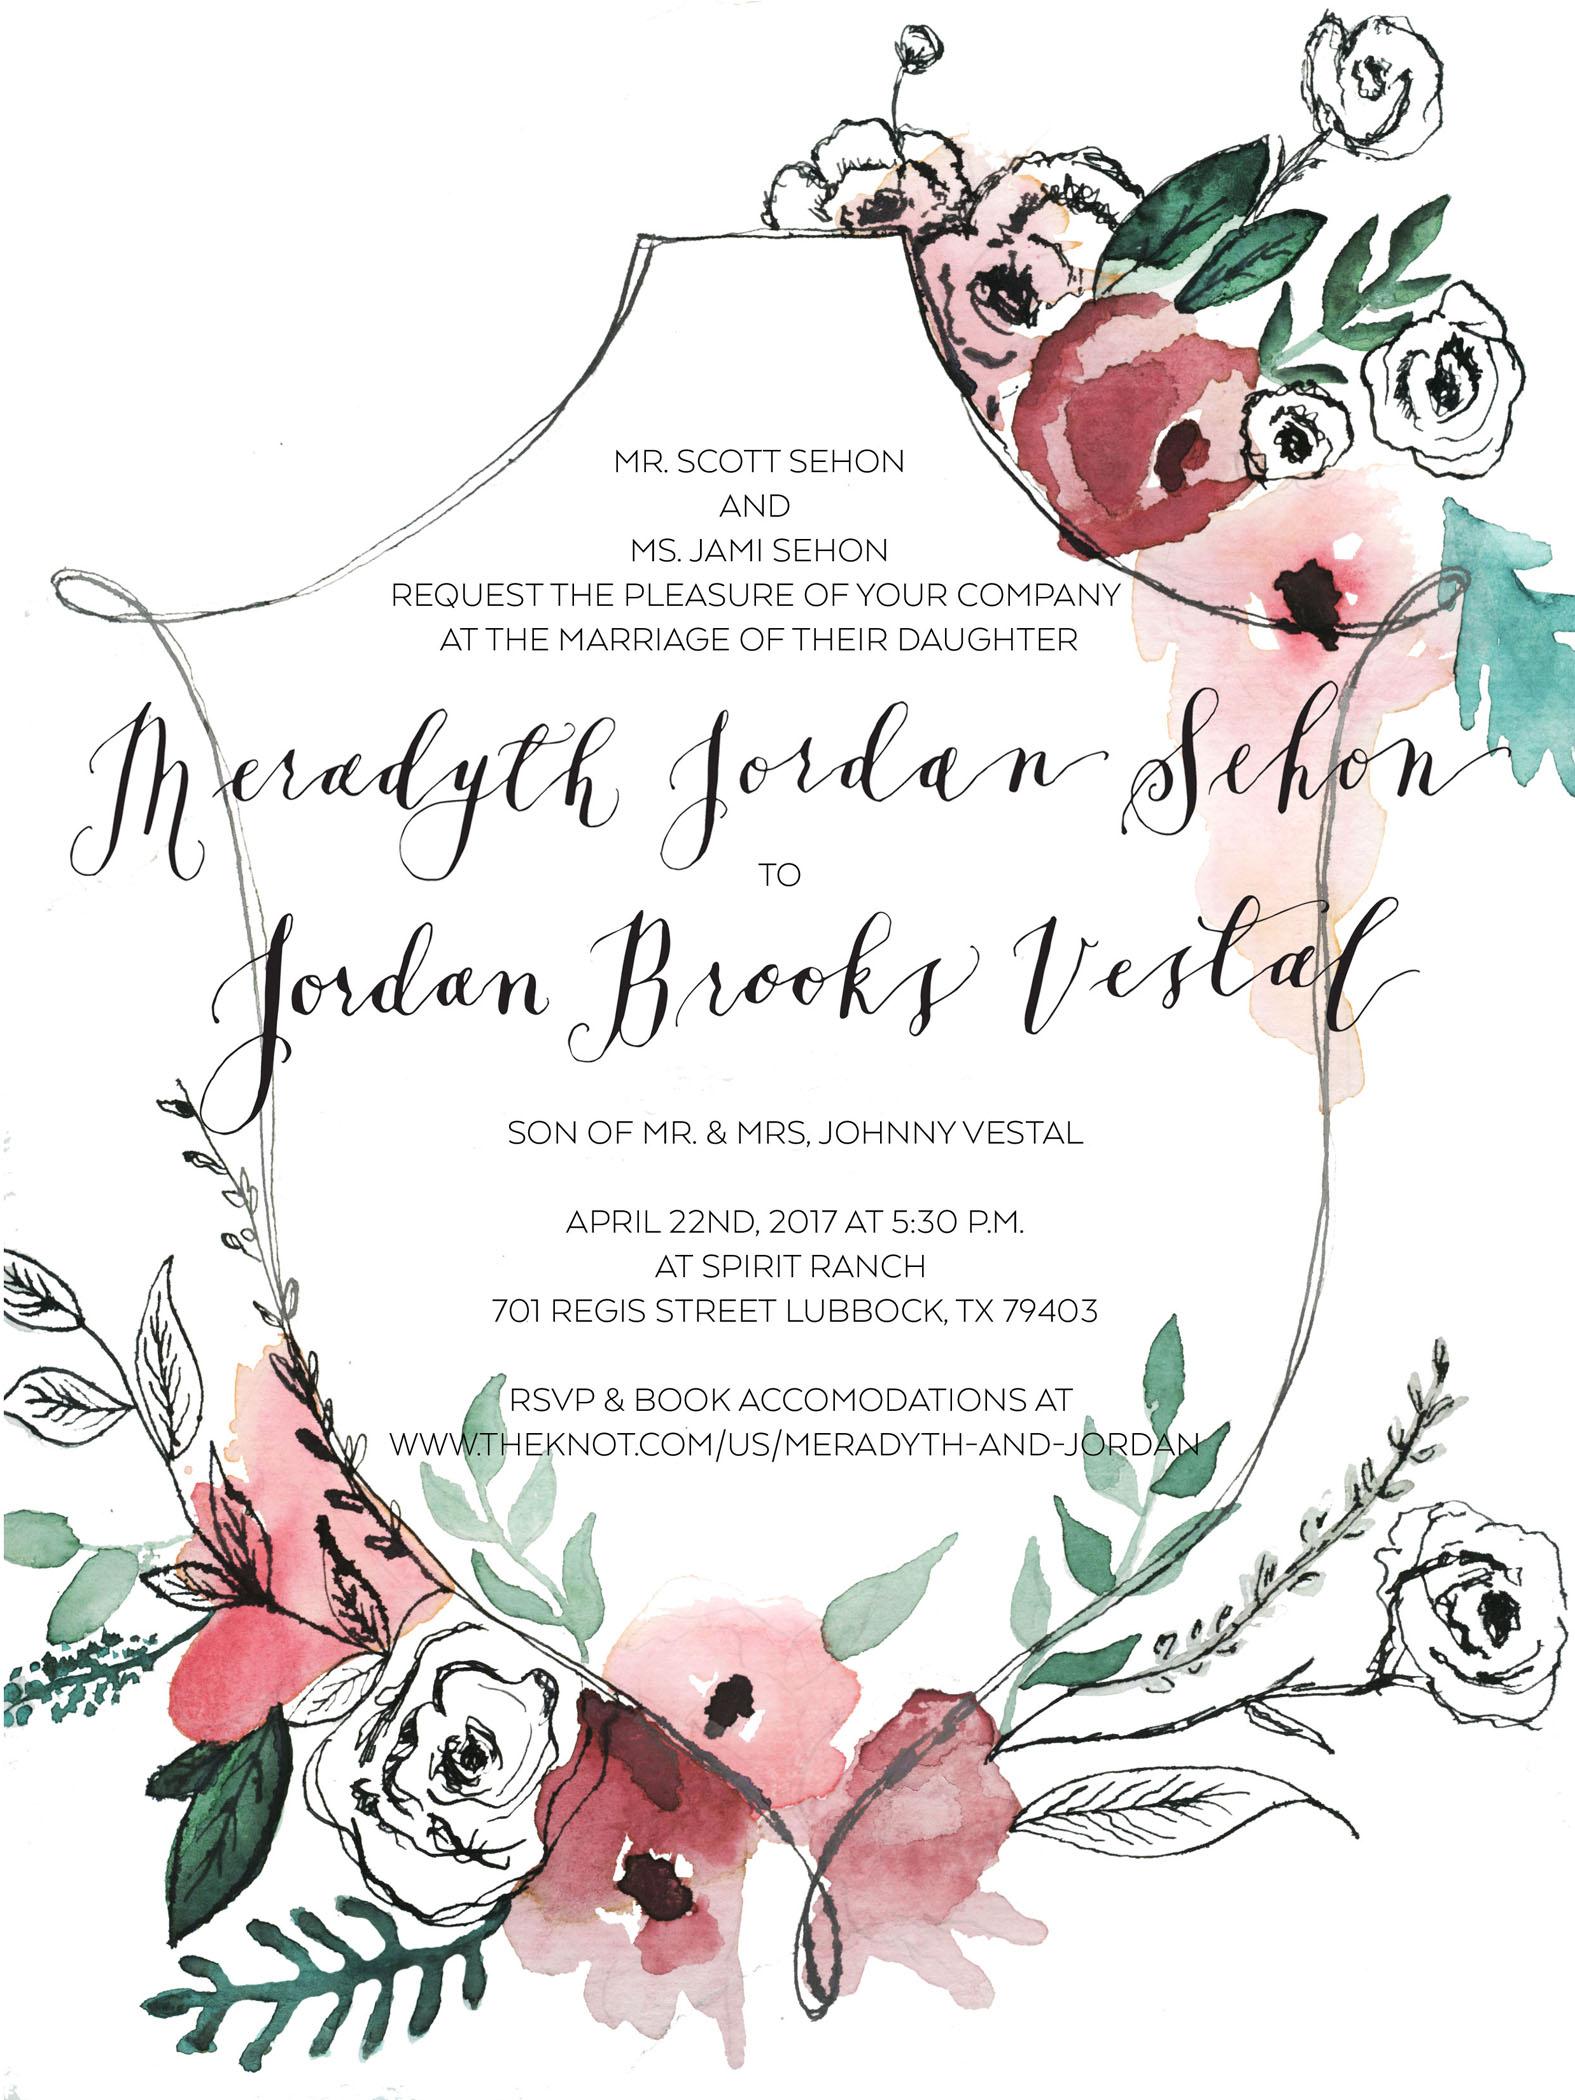 meradyth+jordan_invite_5.25x7.jpg